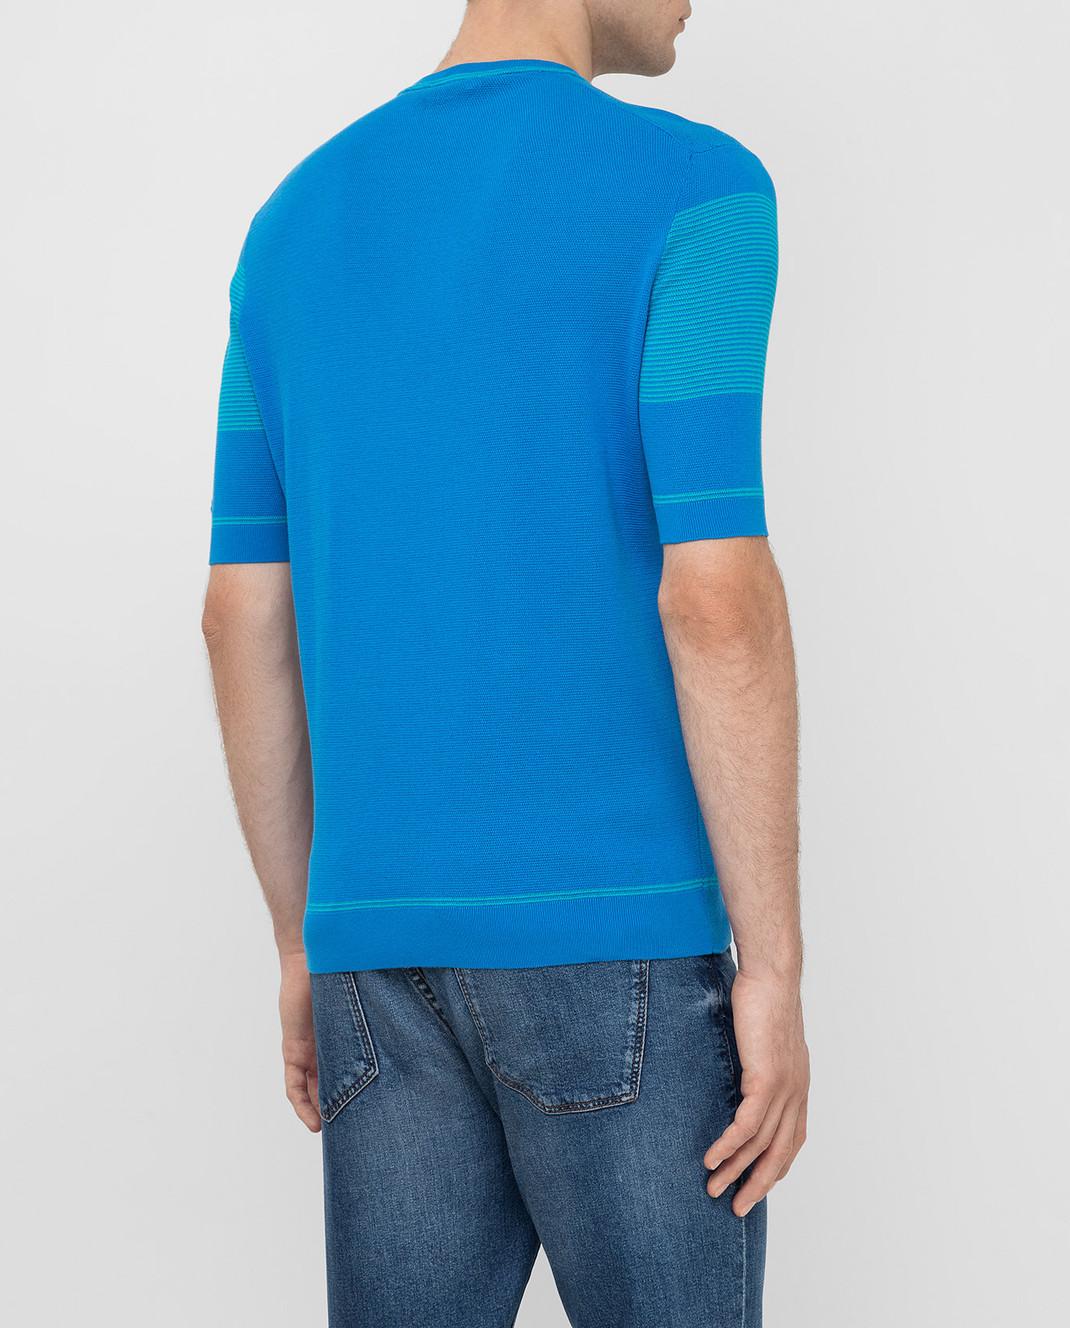 Castello d'Oro Синяя футболка изображение 4